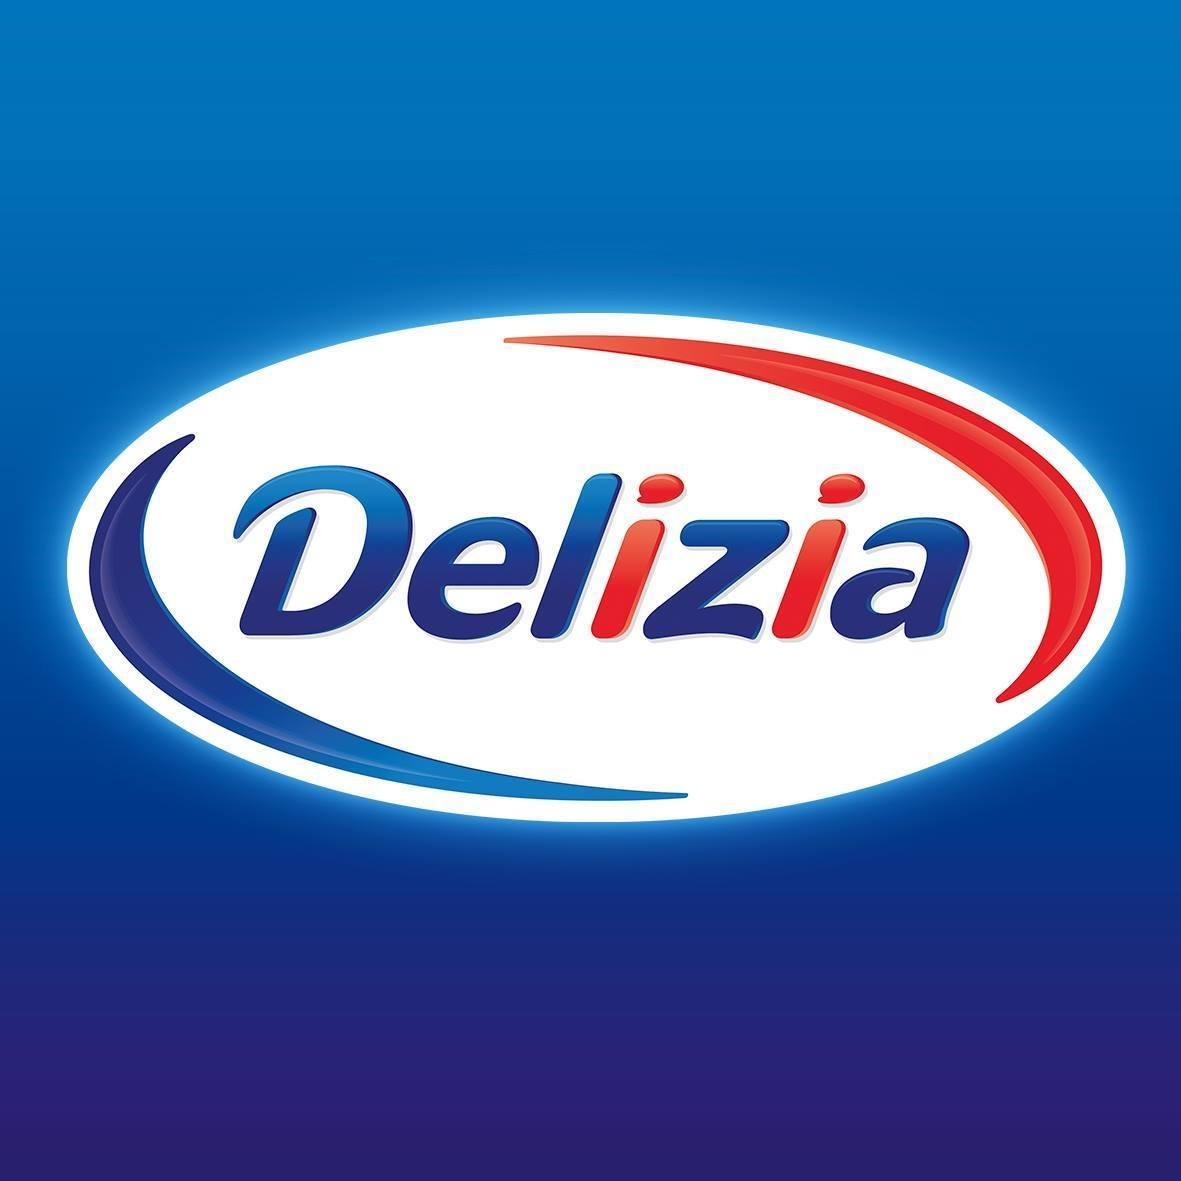 Delizia logo